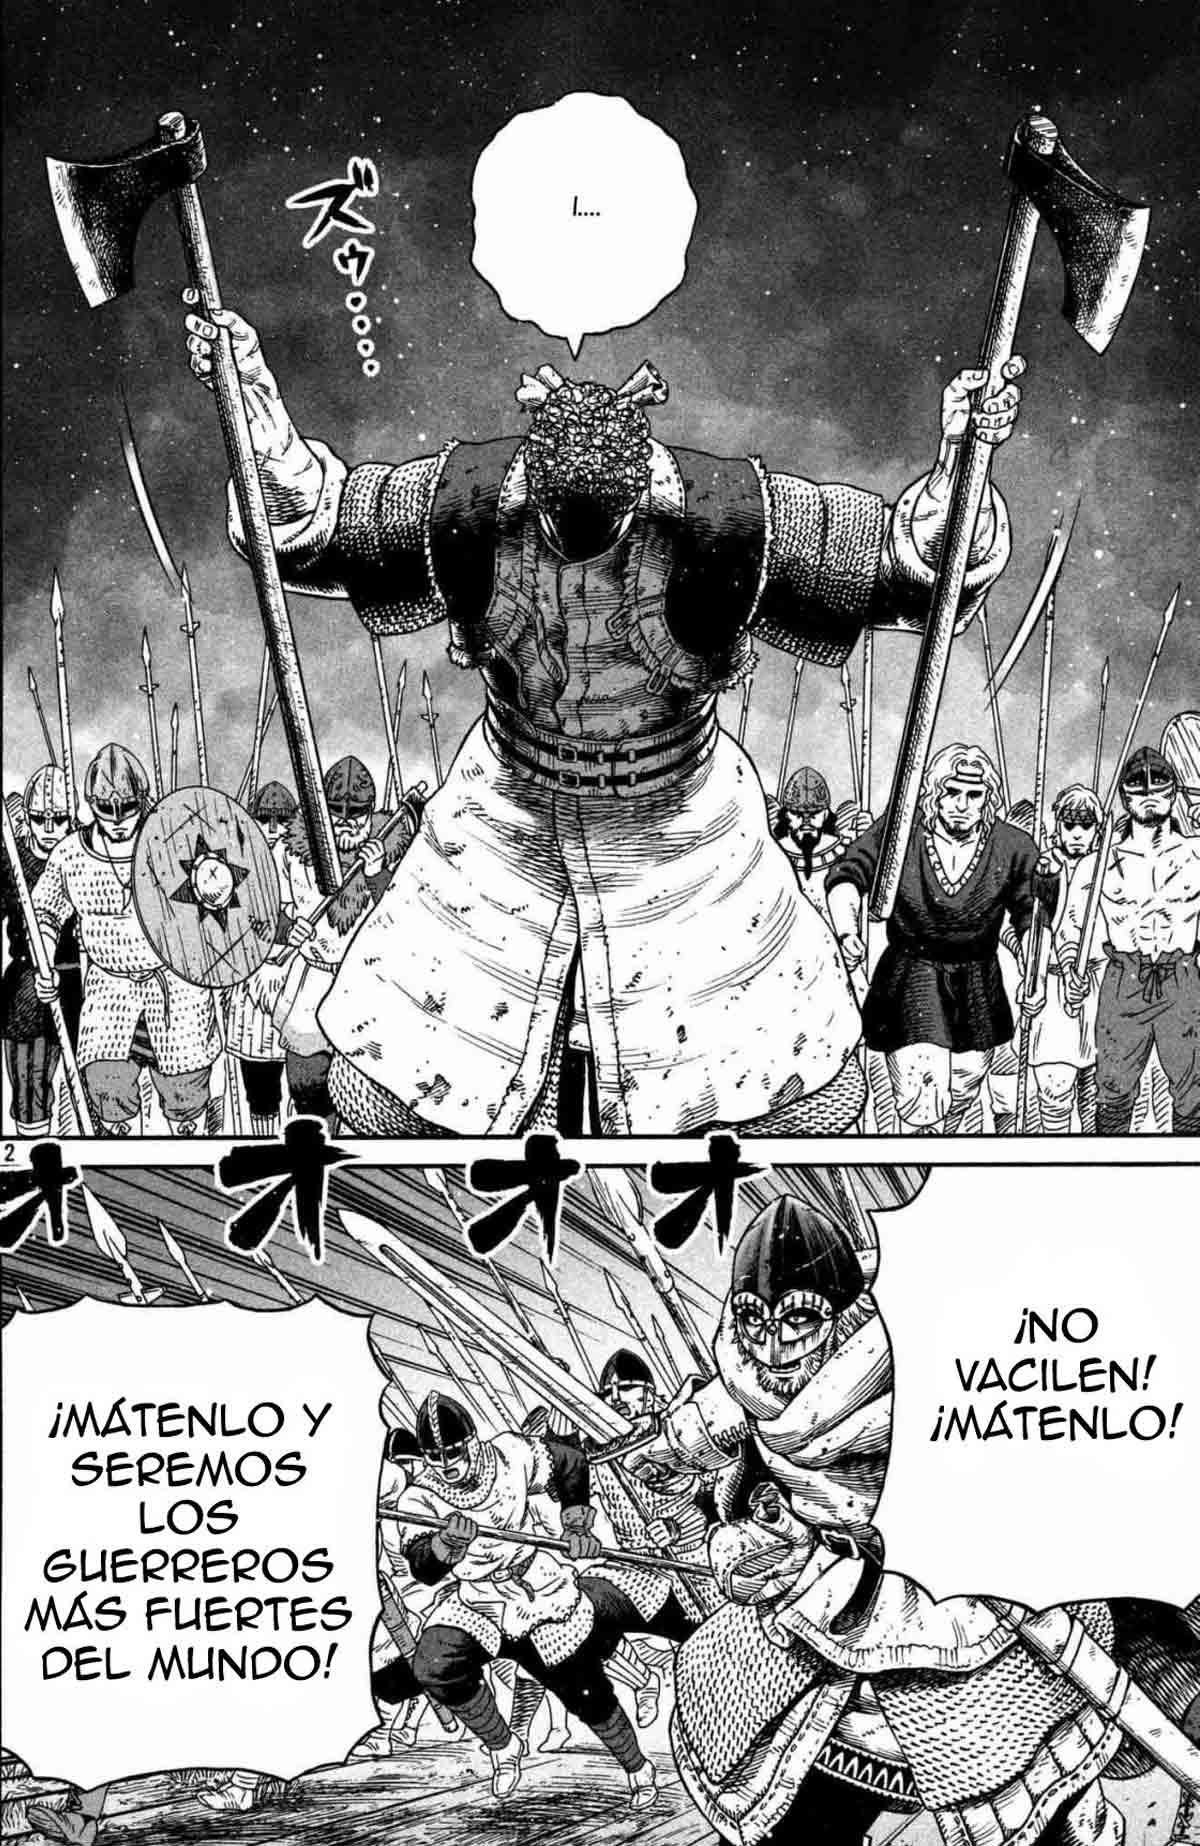 Golem-Comics-Vinland-Saga-de-Makoto-Yukimura-04